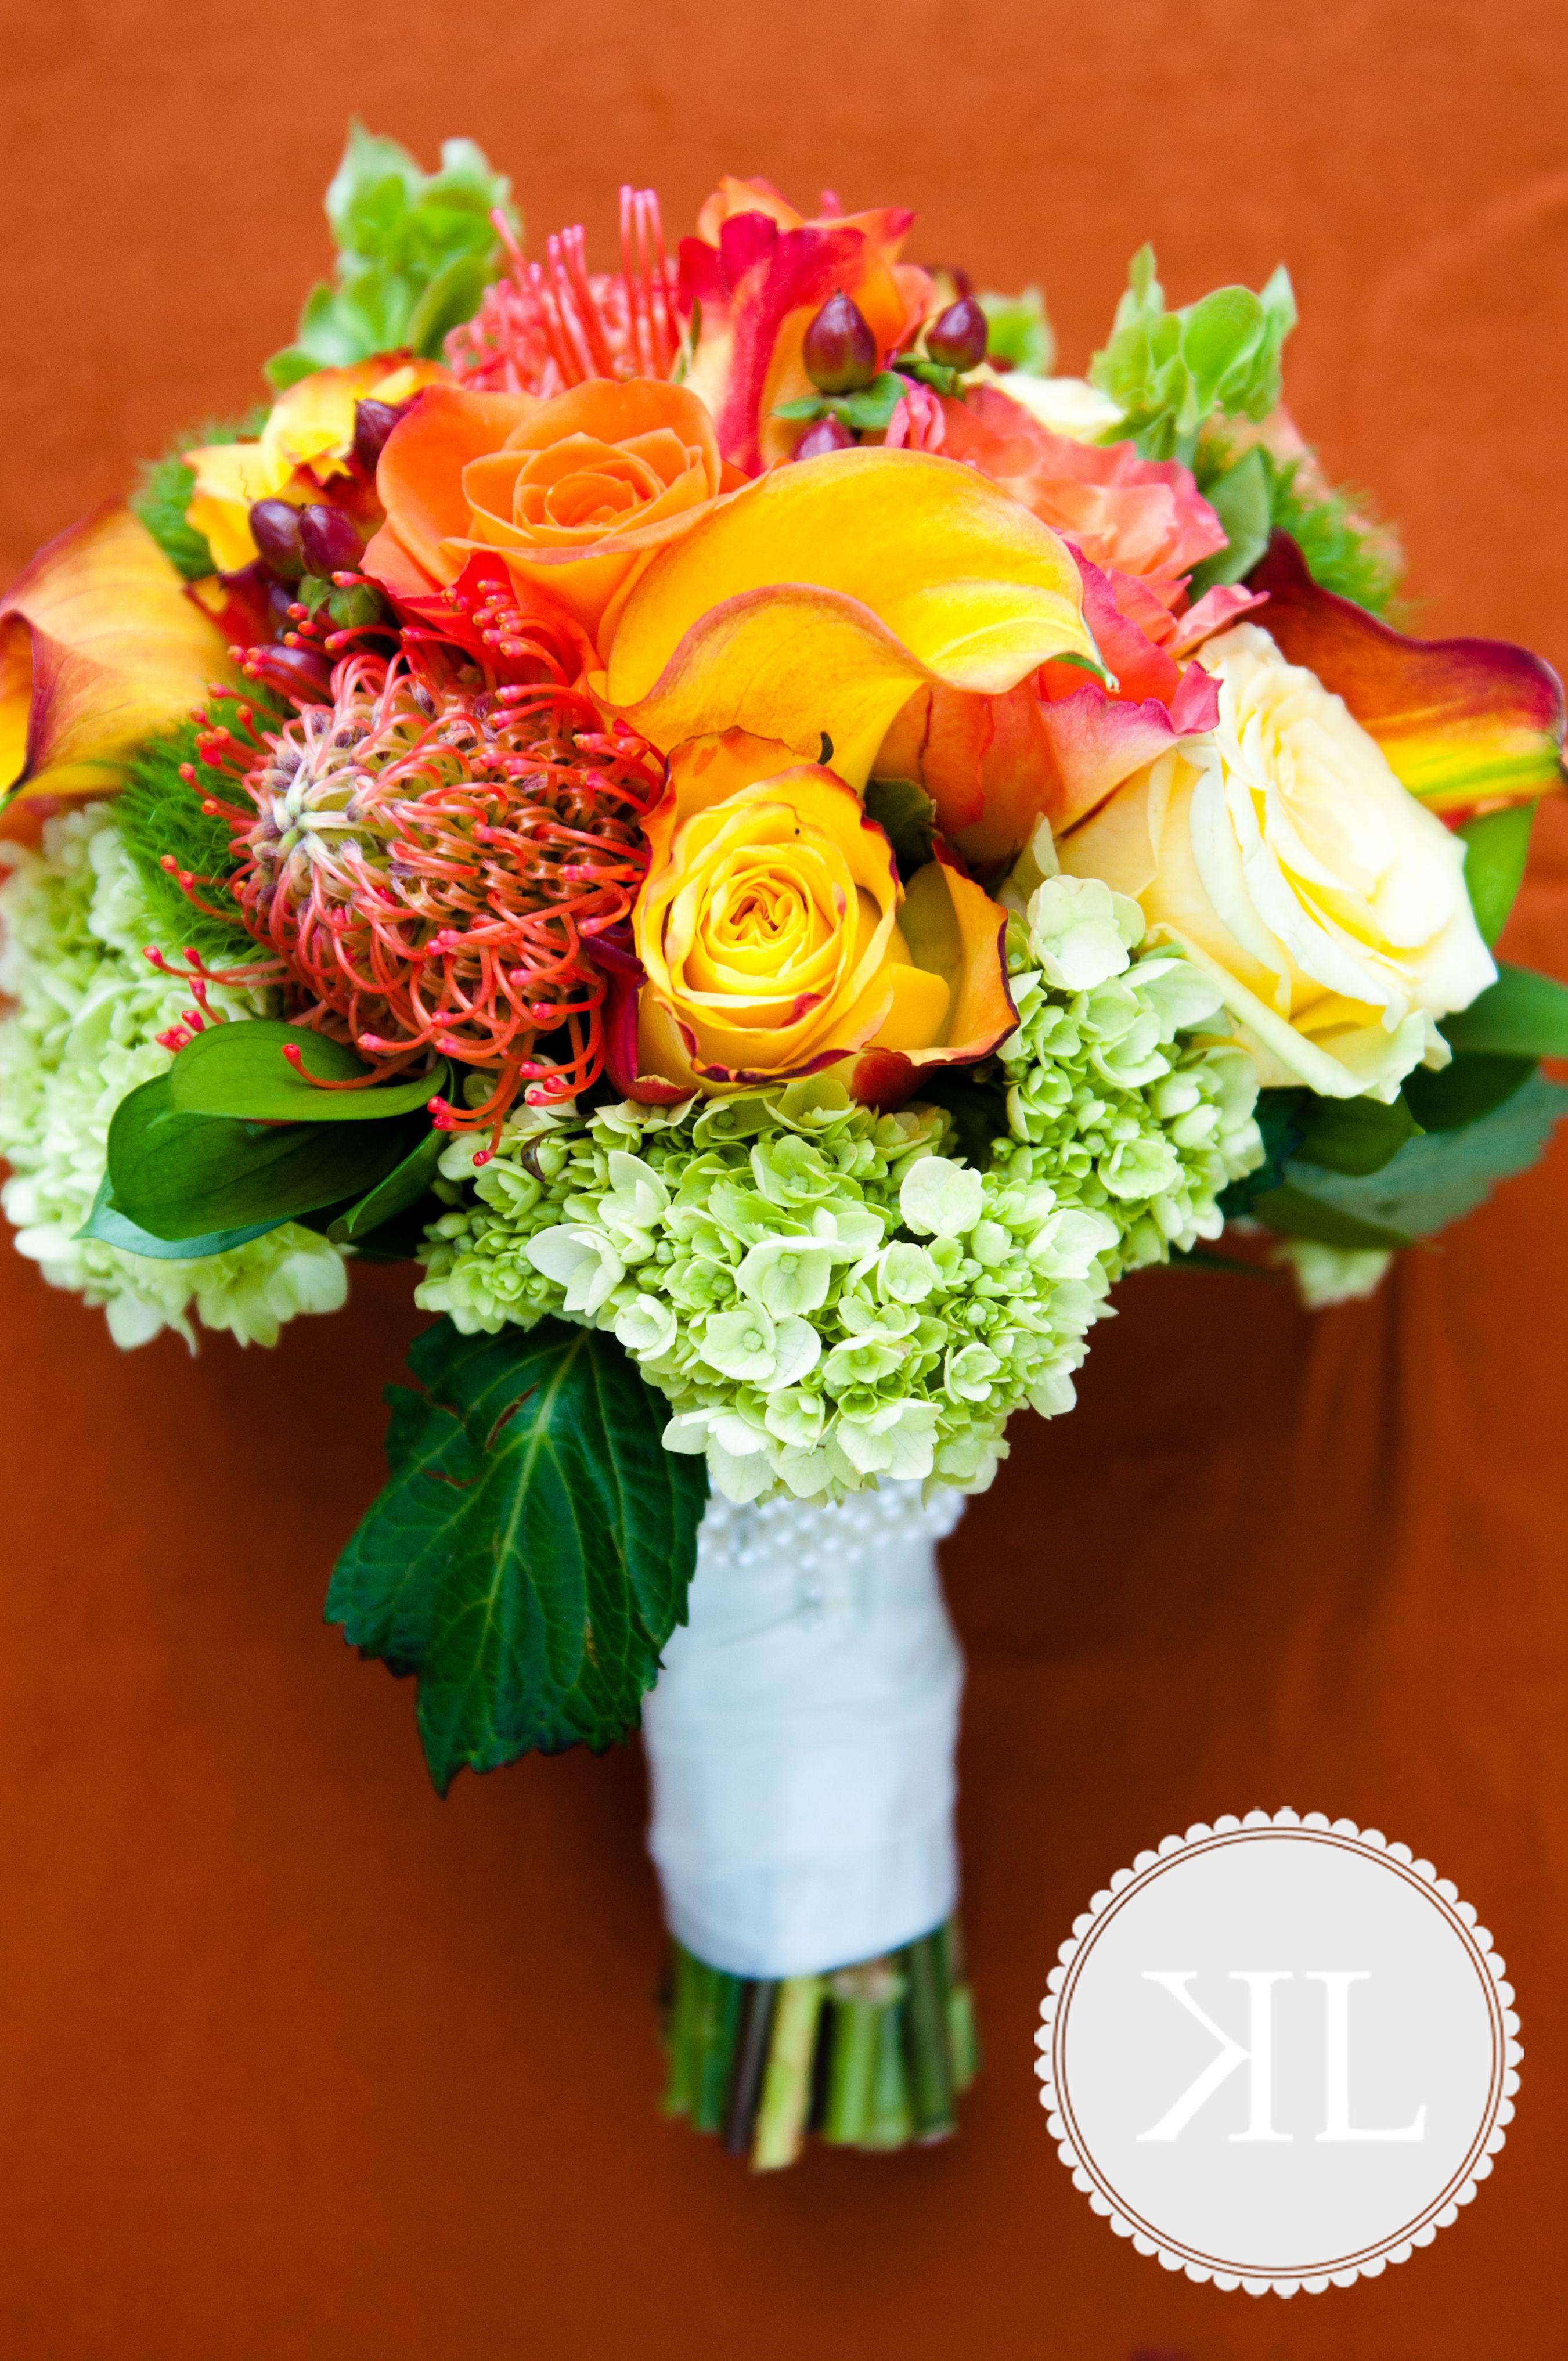 Calla lily, Pin Cushion Protea, Free Sprit, Gelosia and